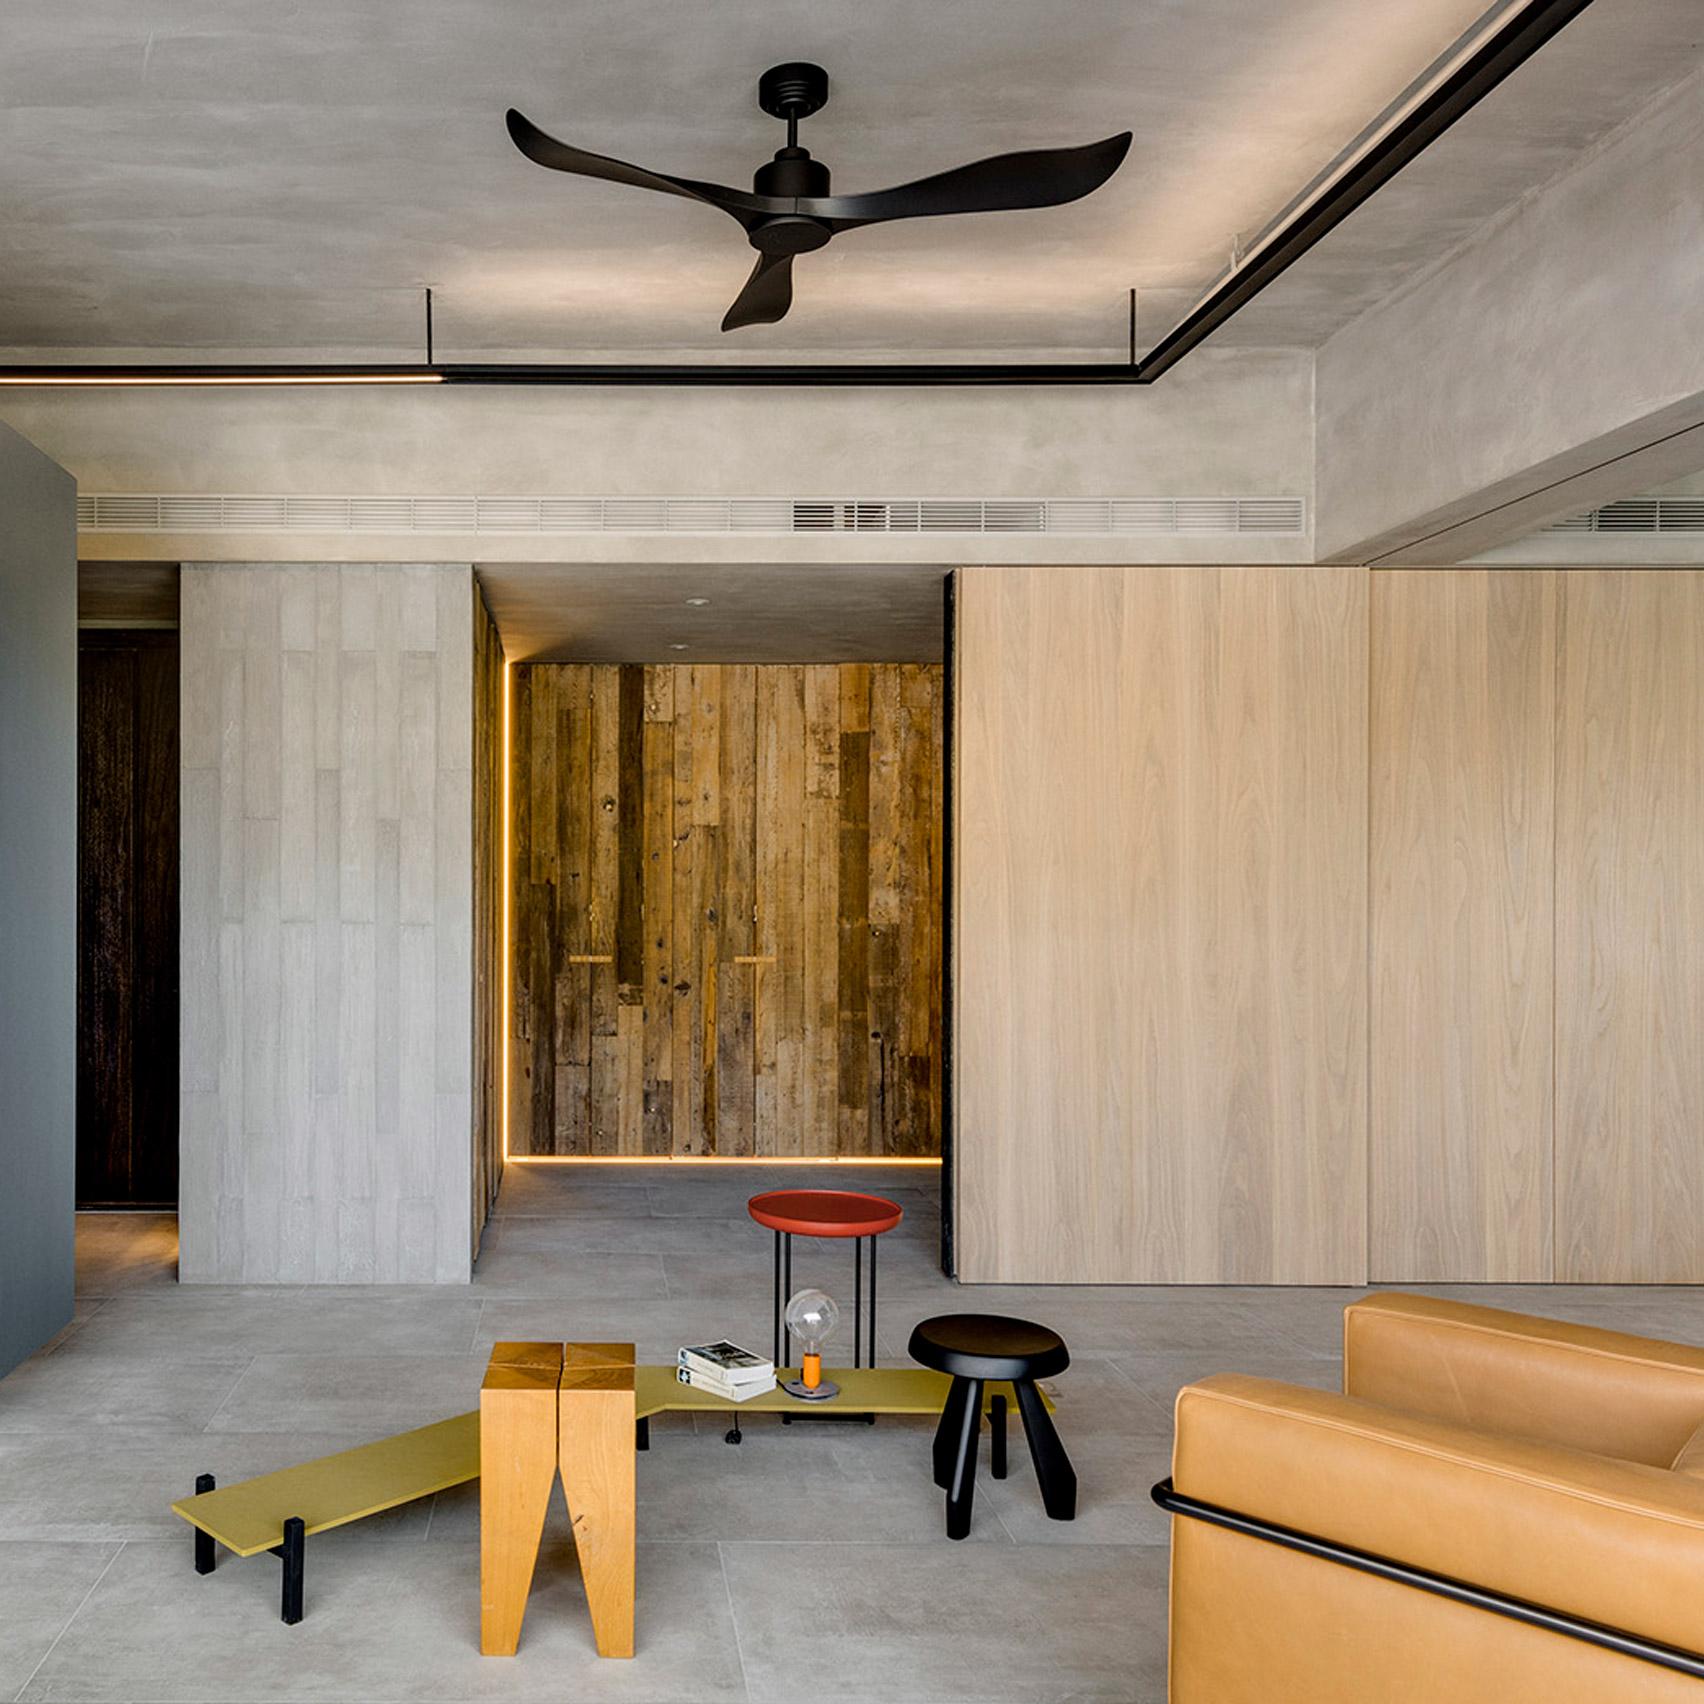 Dezeen's top 10 home interiors of 2018: Din-a-ka apartment